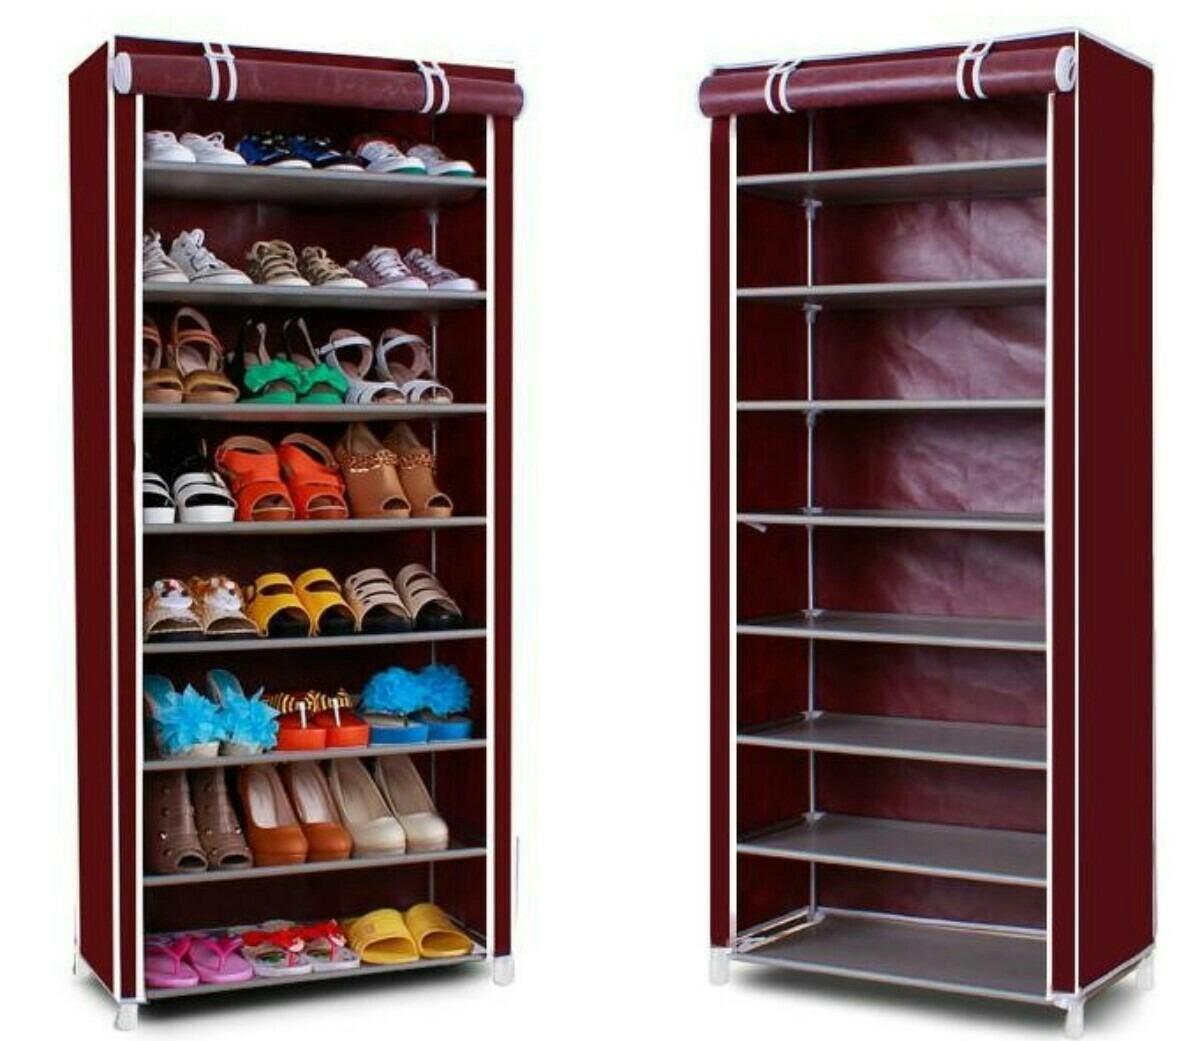 Mueble para zapatos s 70 00 en mercado libre - Muebles para zapatos ...